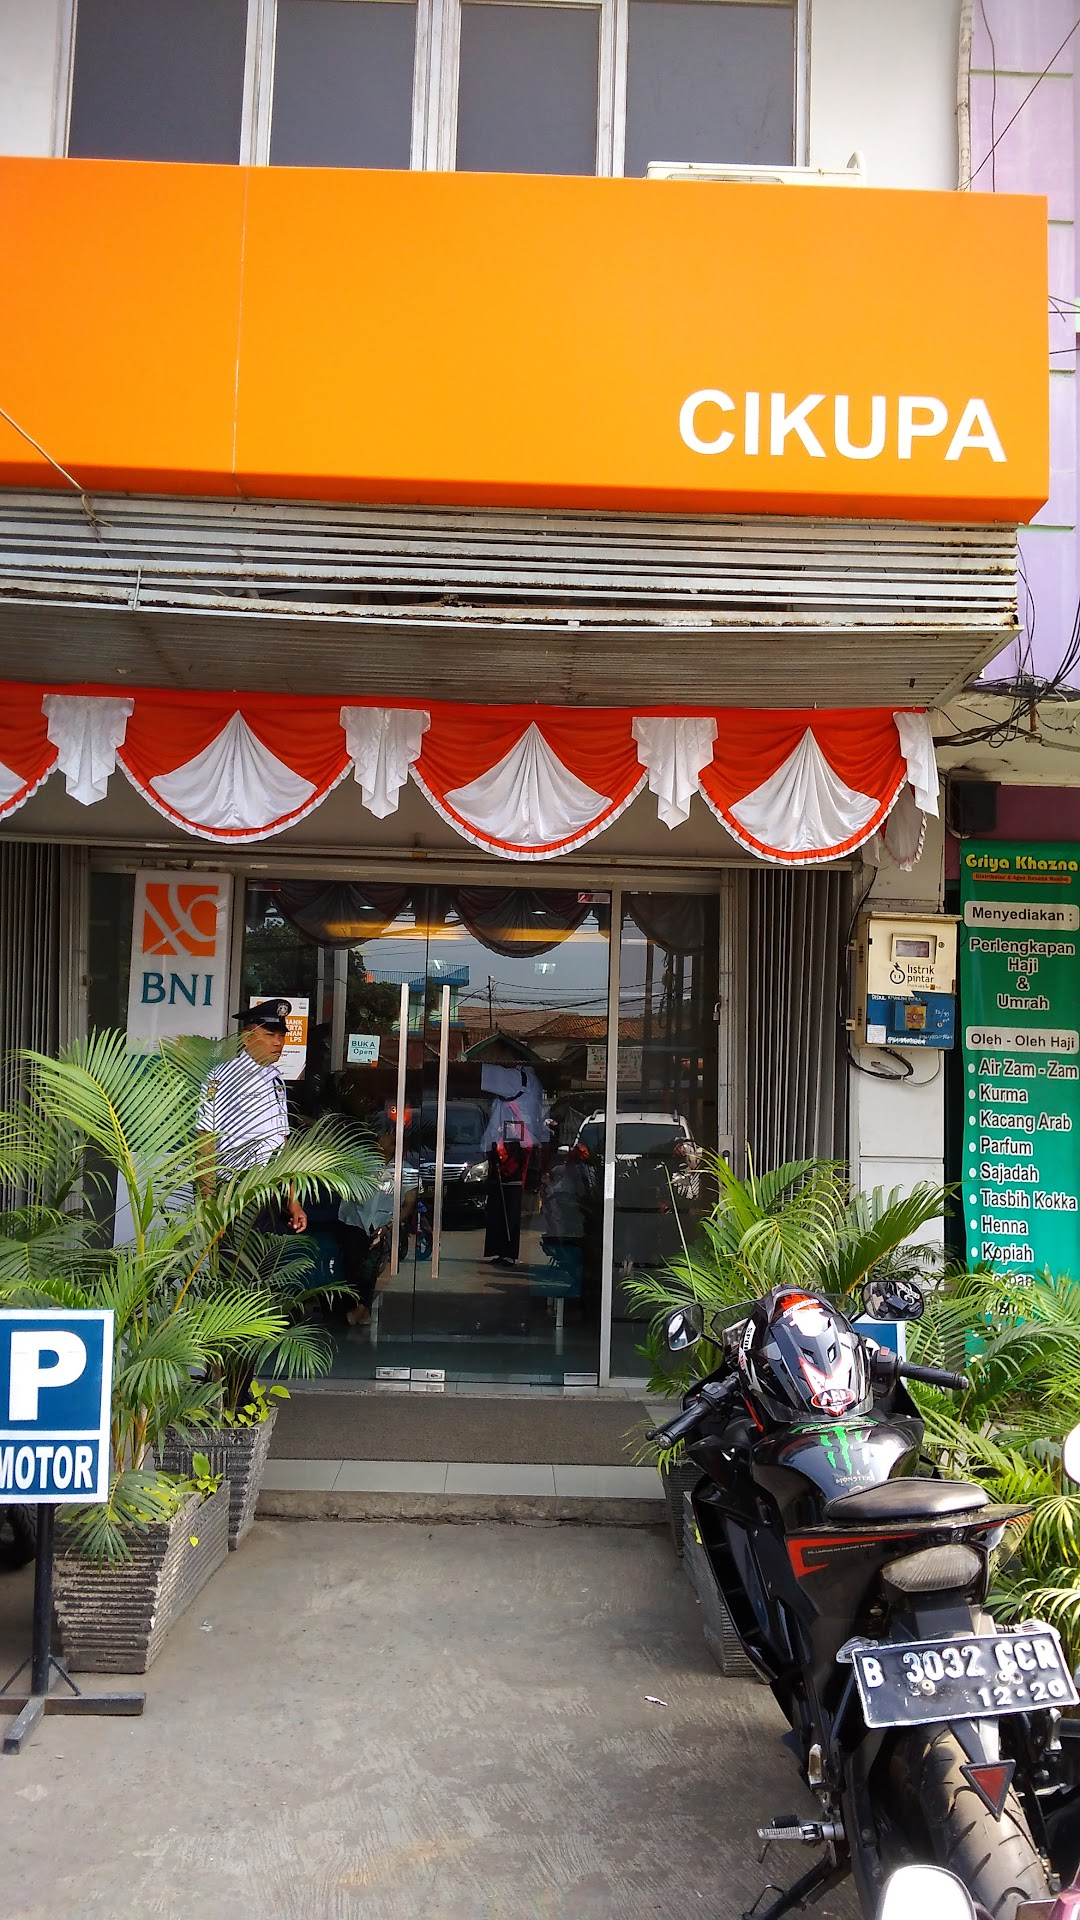 Bni Cikupa Di Kota Tangerang